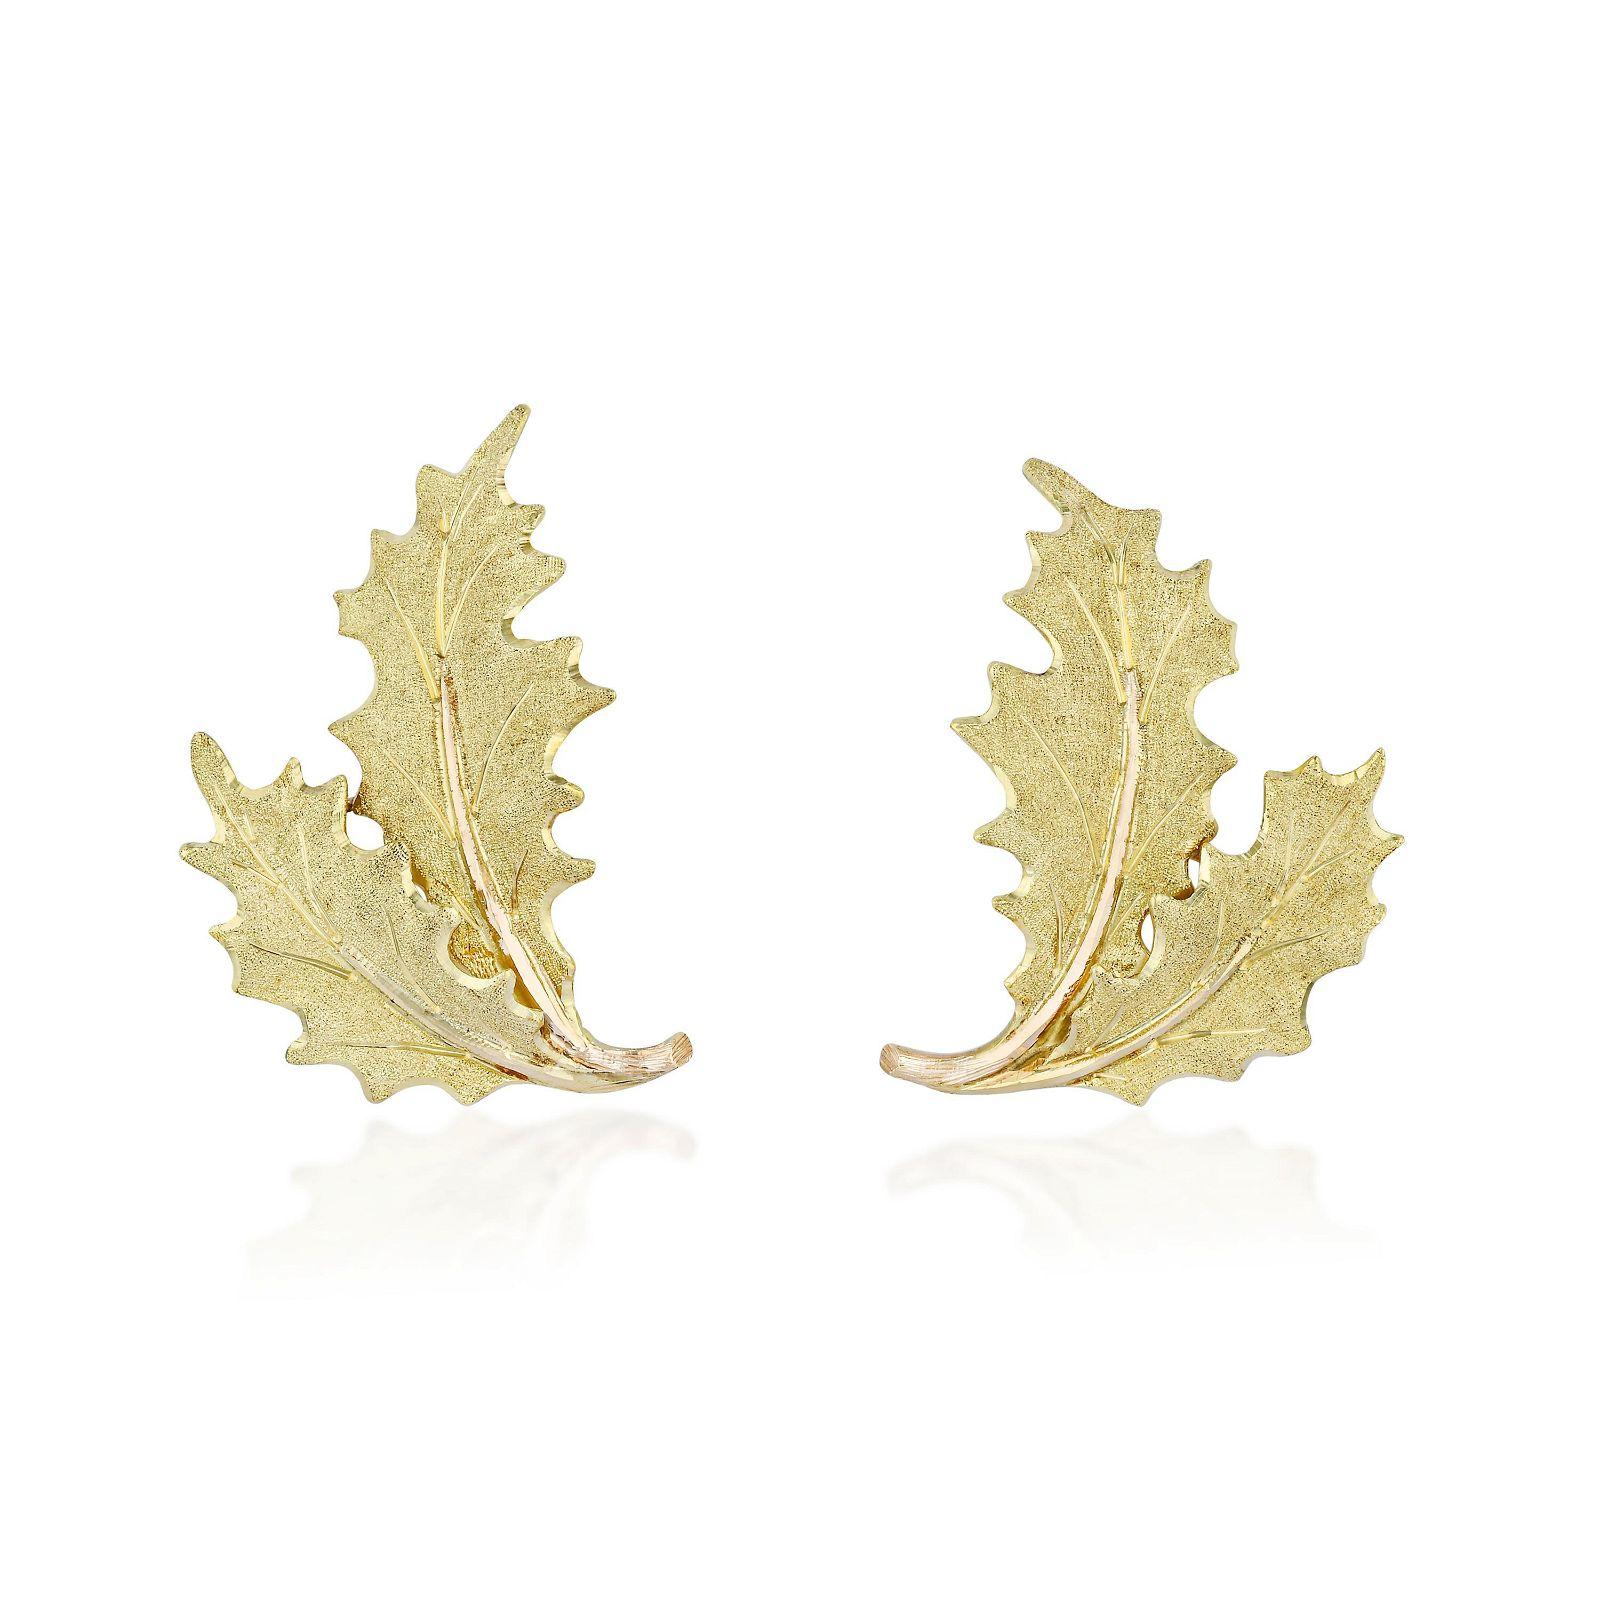 Mario Buccellati Leaf Earclips